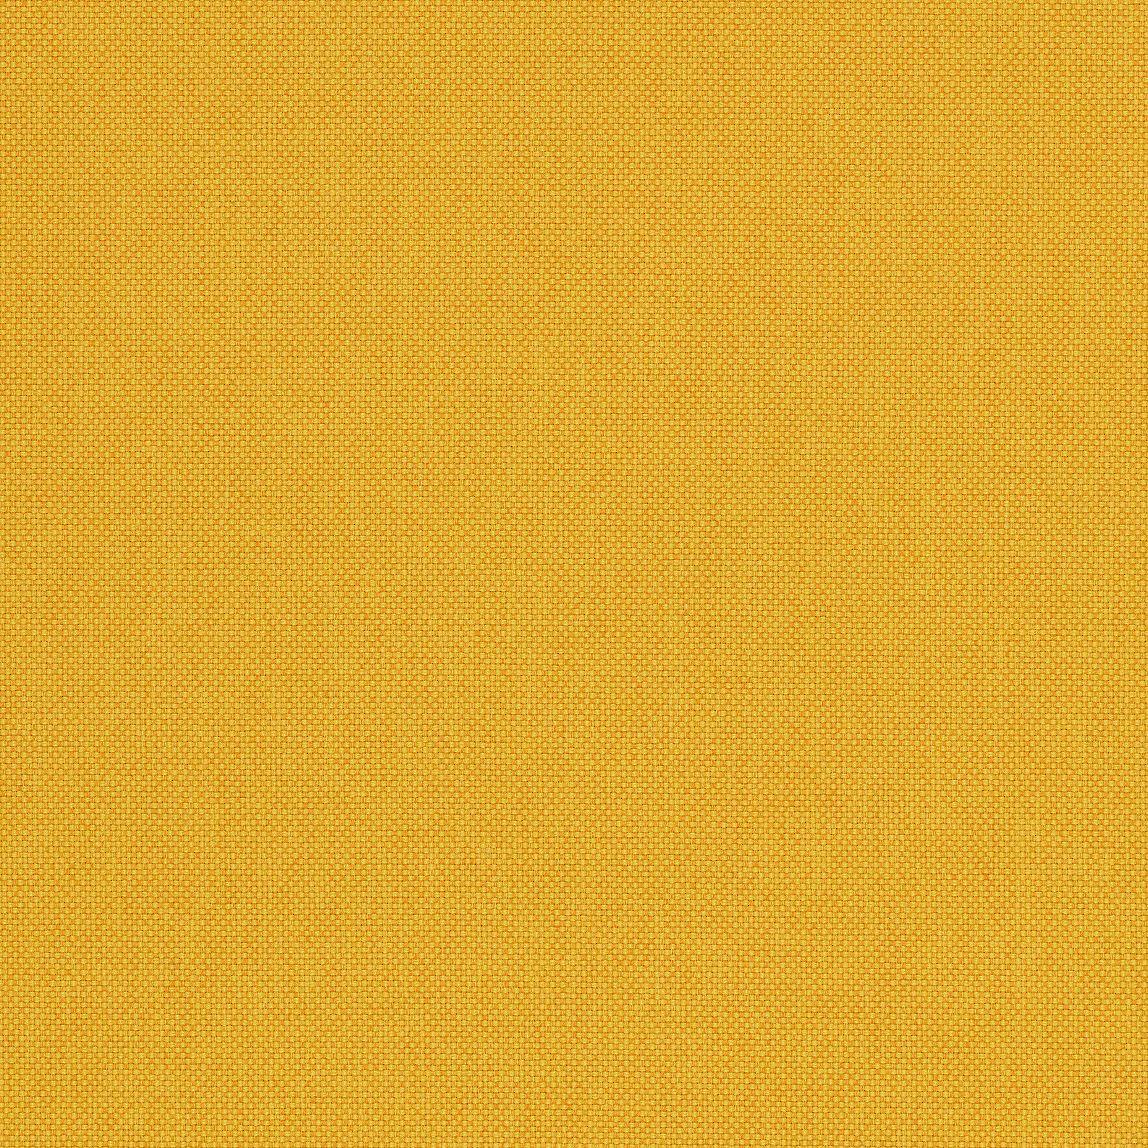 Mode Goldenrod Swatch